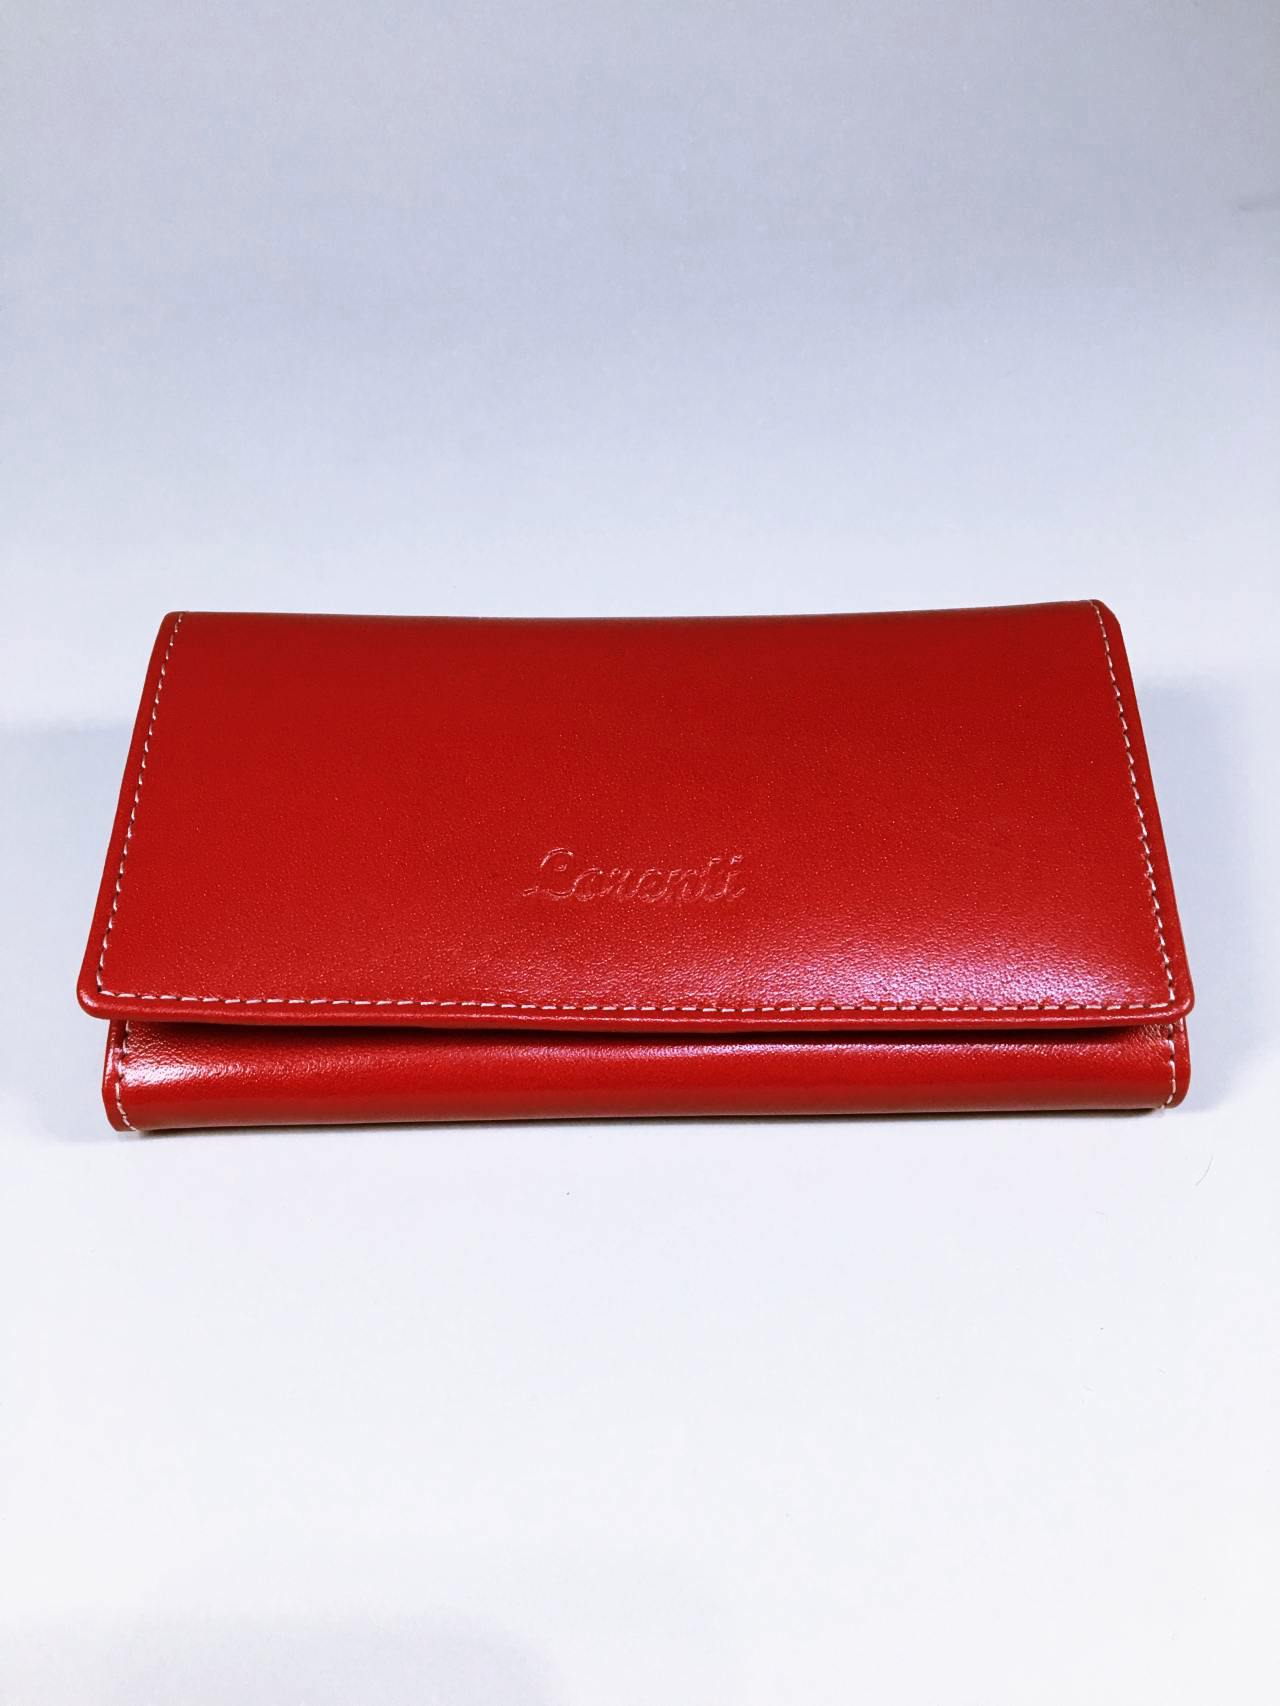 Kožená peněženka Lorenti N červená 01